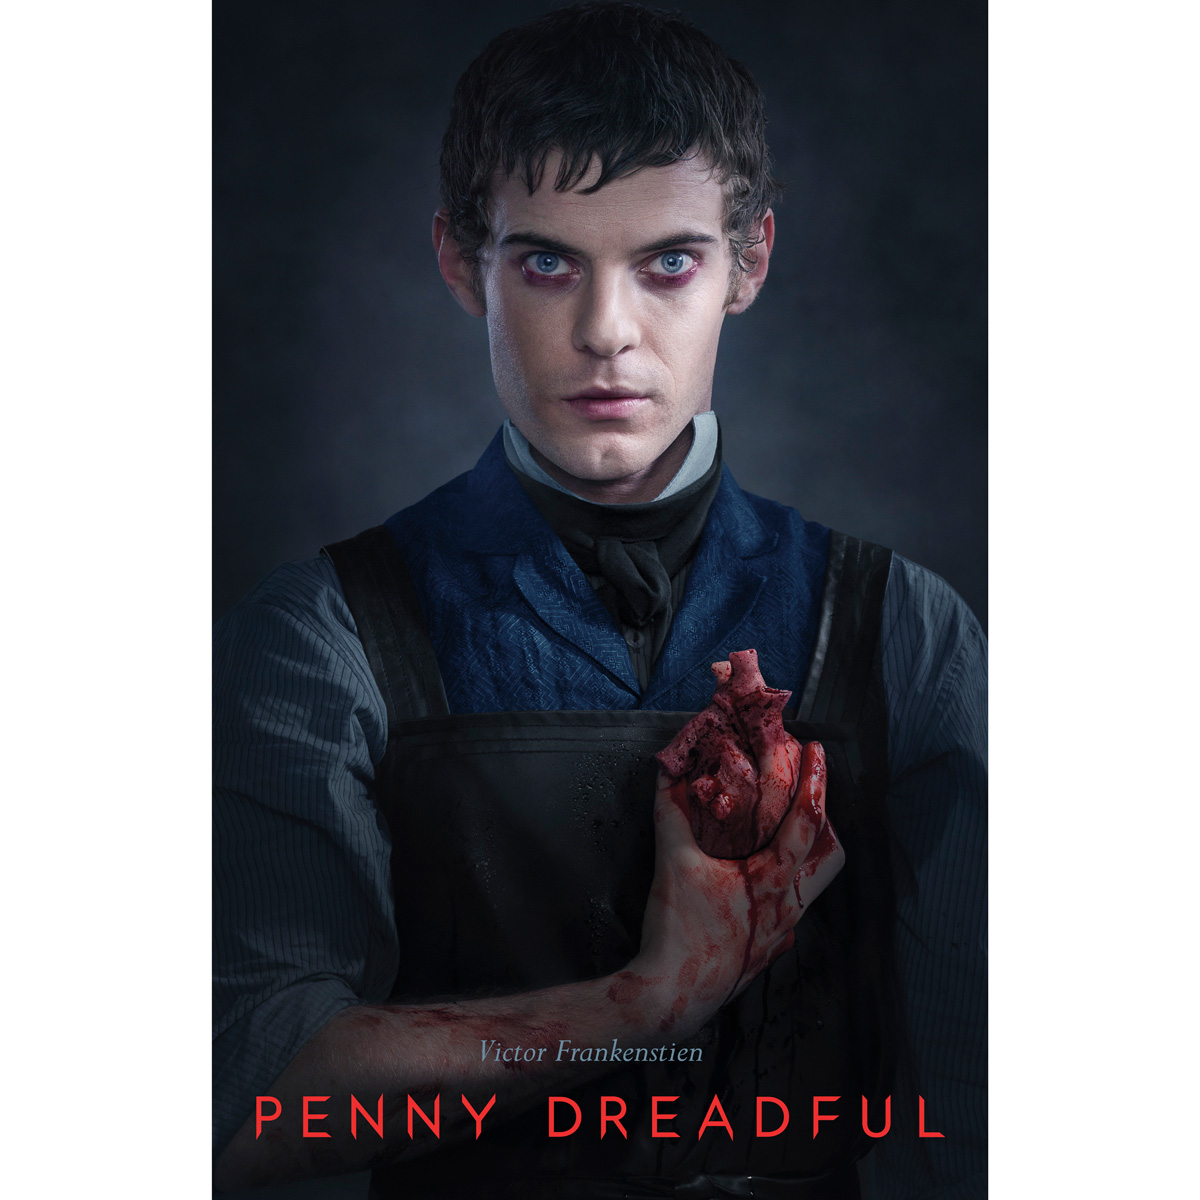 Penny Dreadful Dr. Victor Frankenstein Poster [11x17]